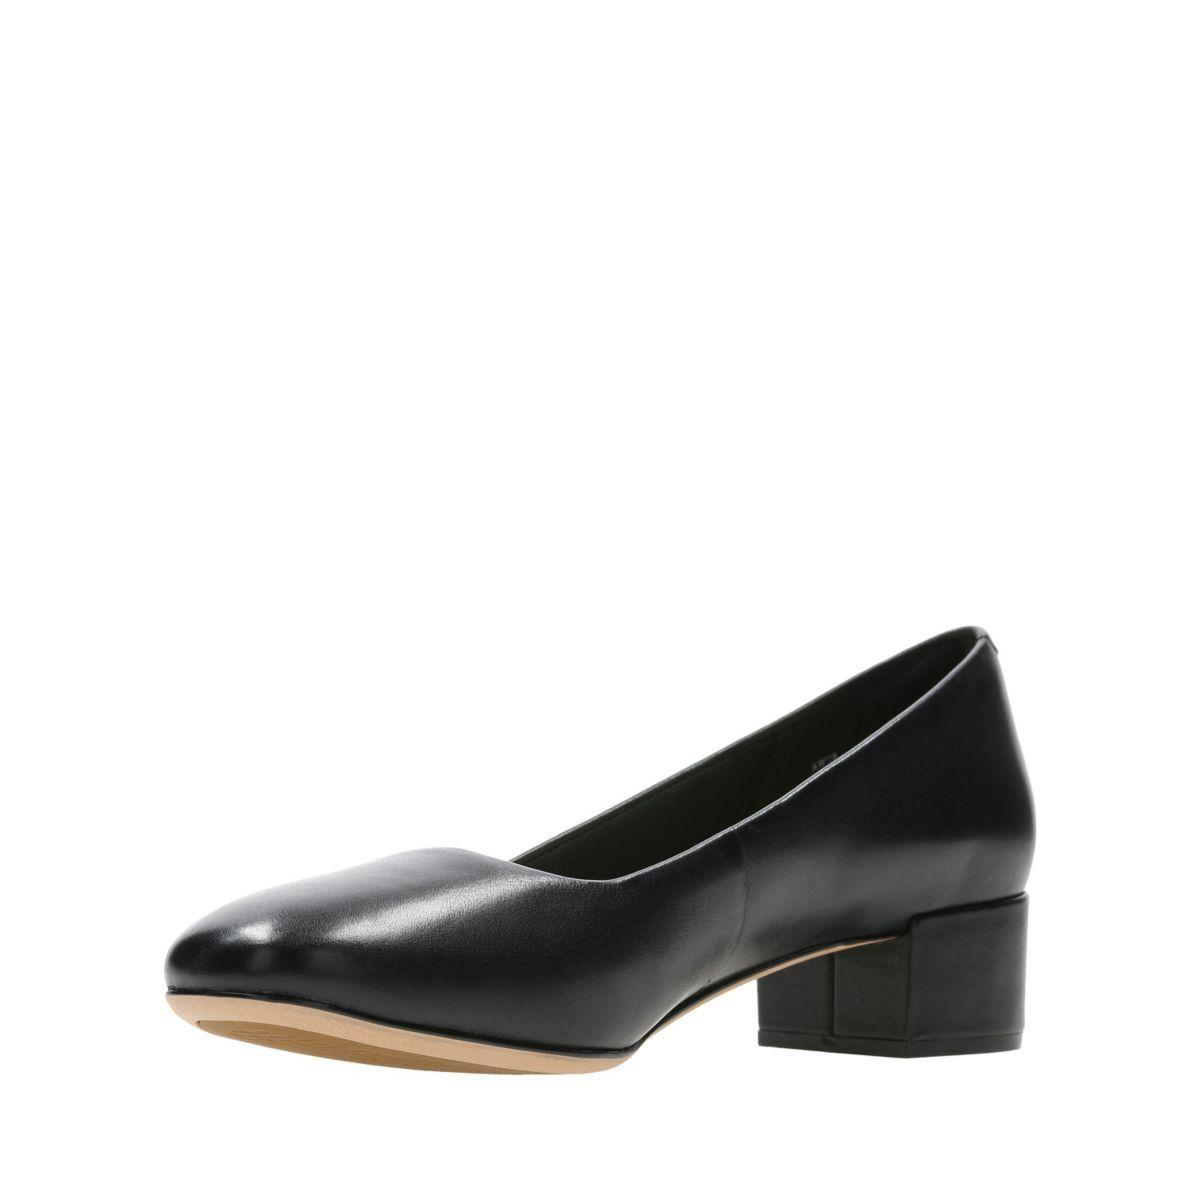 37364c6c294 Clarks Orabella Alice - Womens Shoes Black Leather 6.5 D (Medium)   womenshoesblack